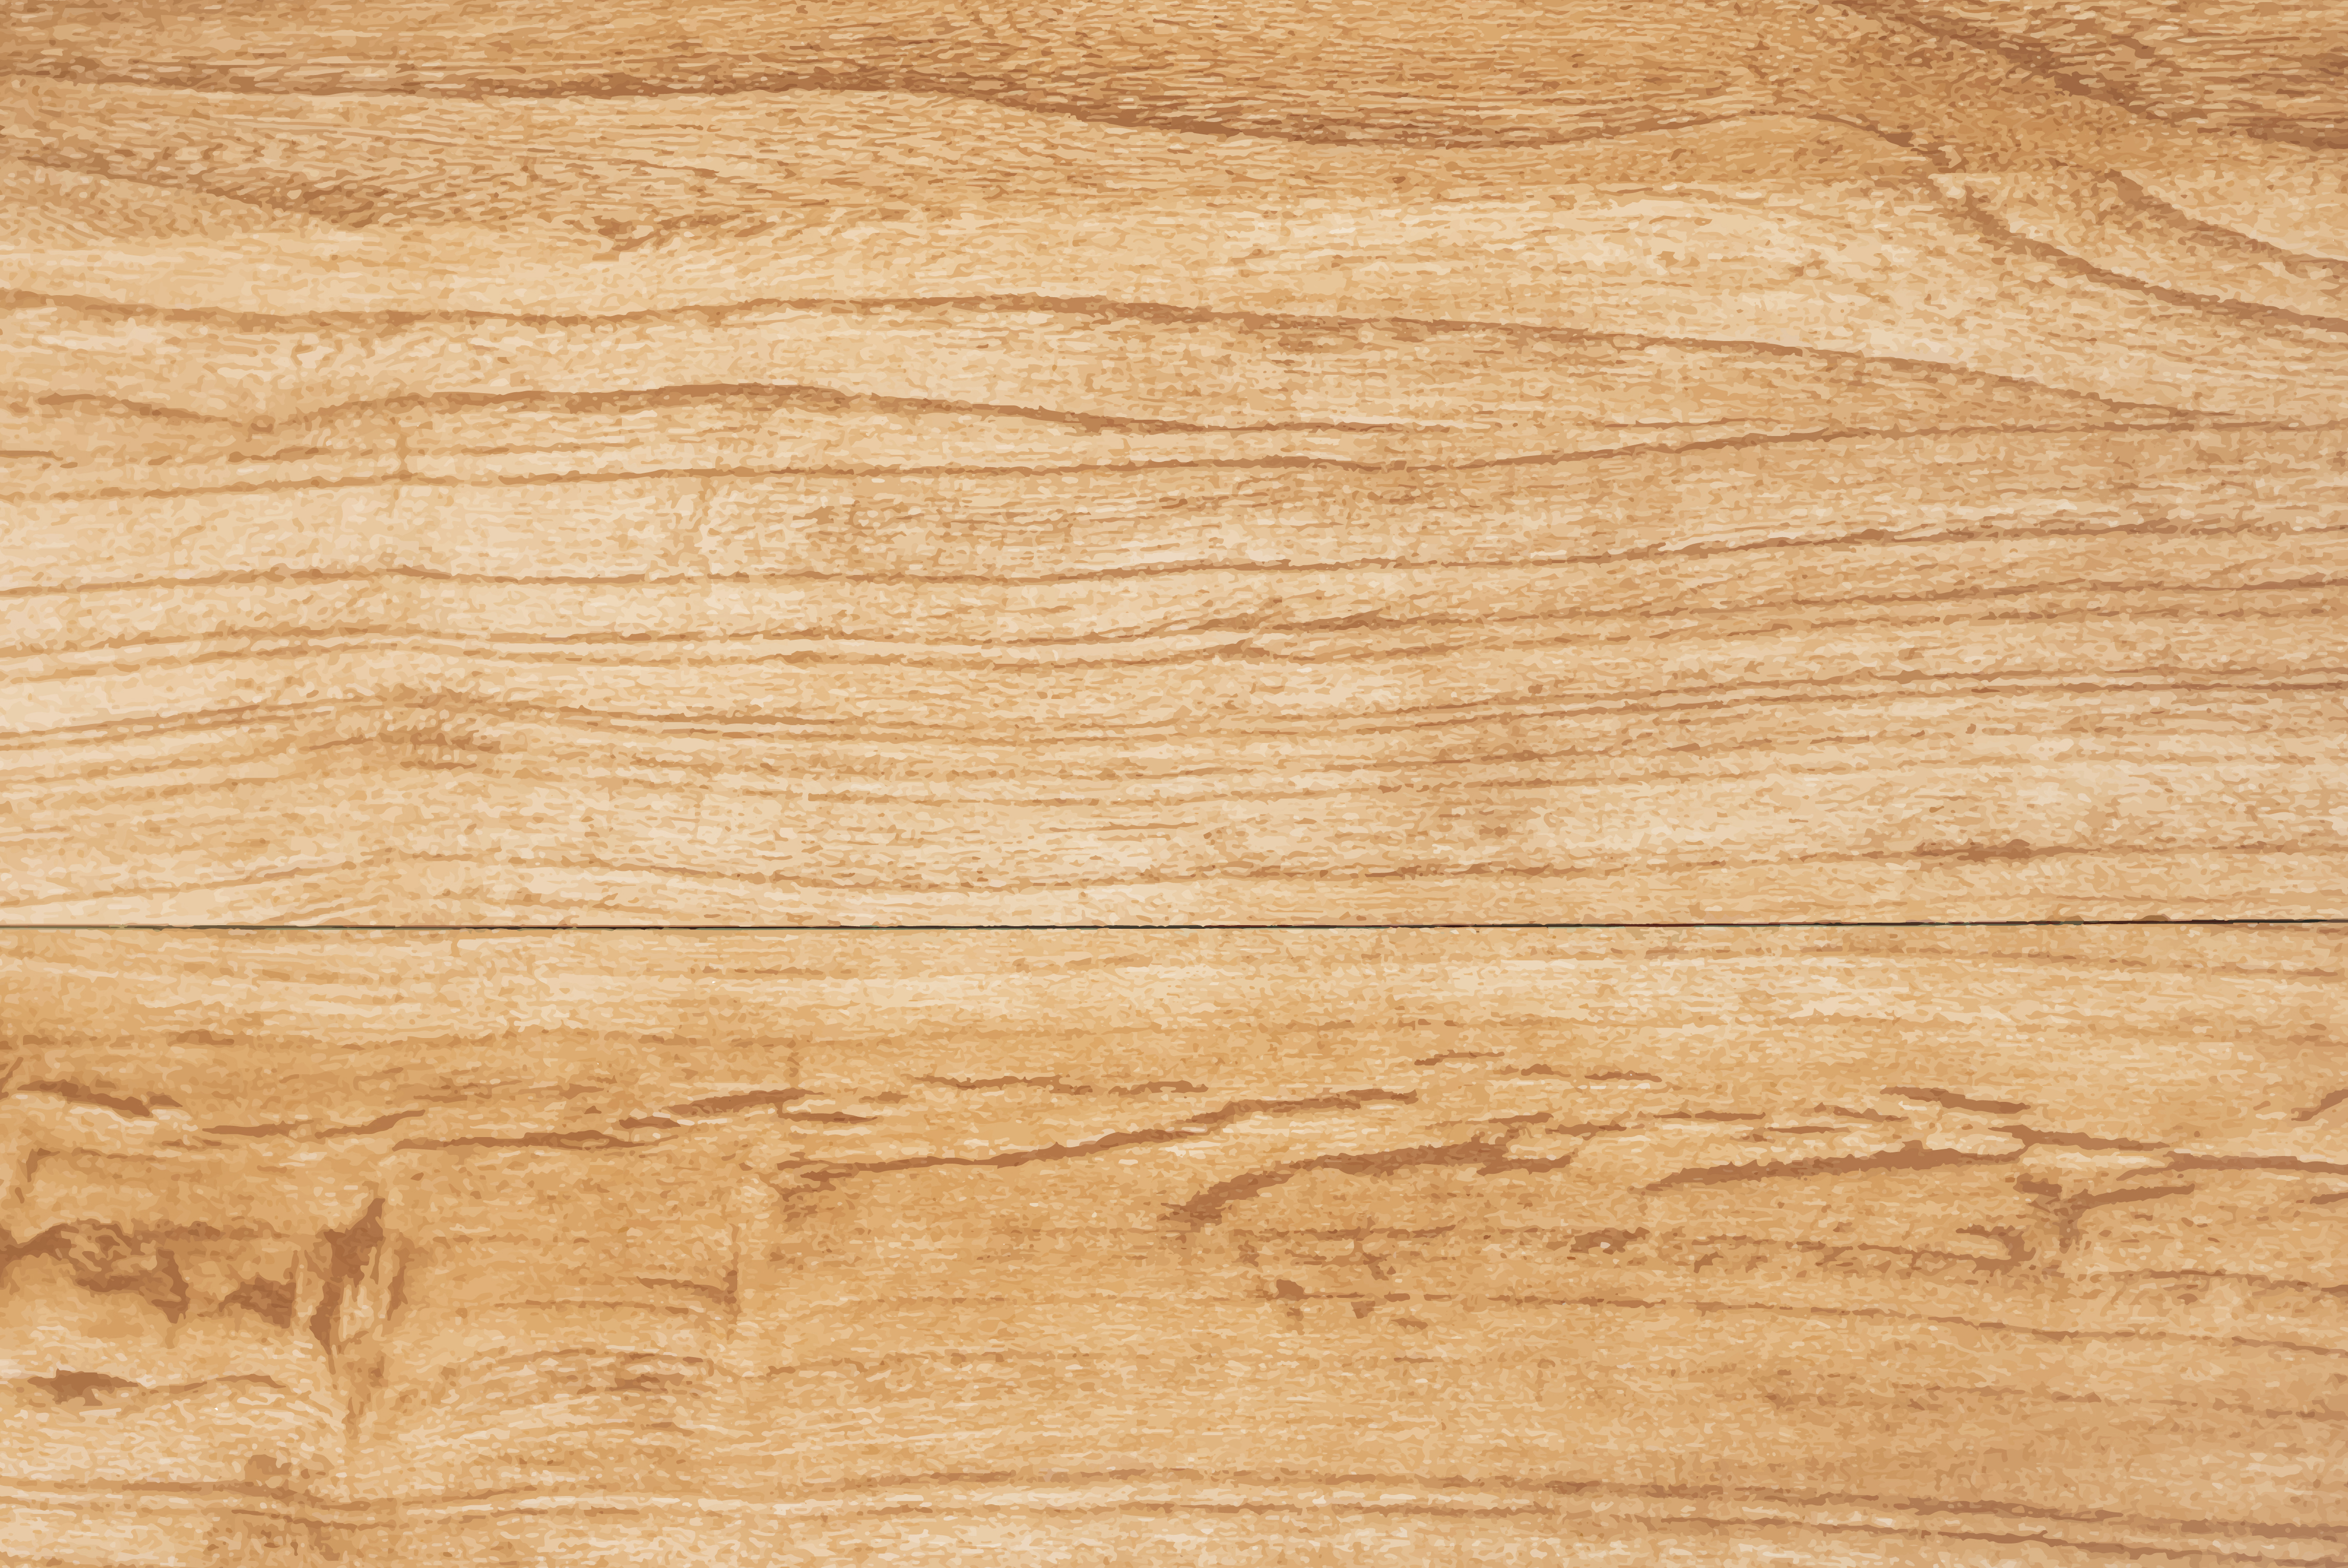 Cerca De Un Fondo De Madera Ligero Con Textura De Suelo